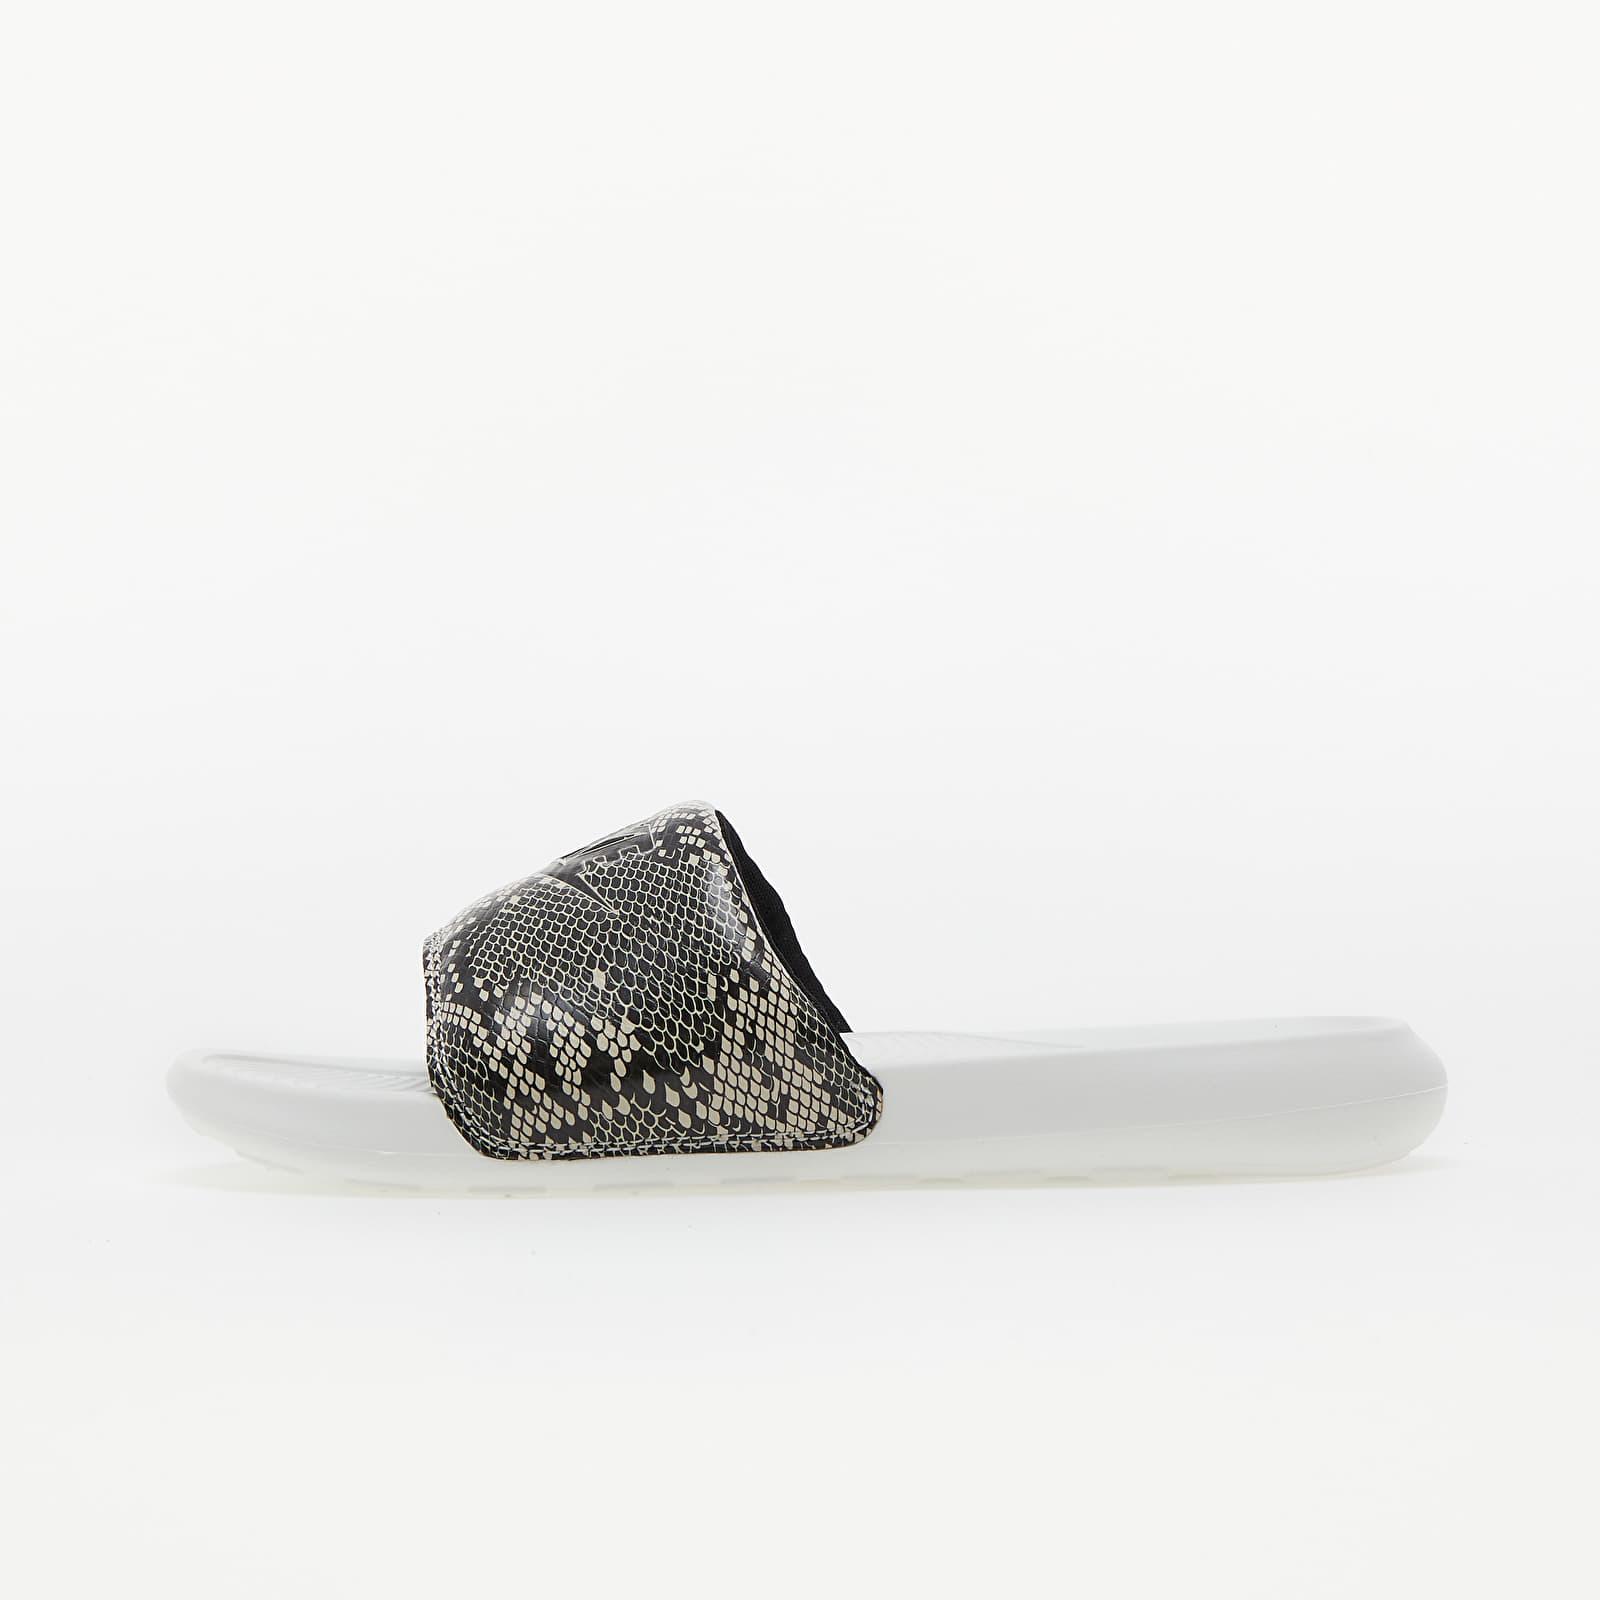 Nike W Victori One Slide Print Desert Sand/ Black-Summit White EUR 40.5